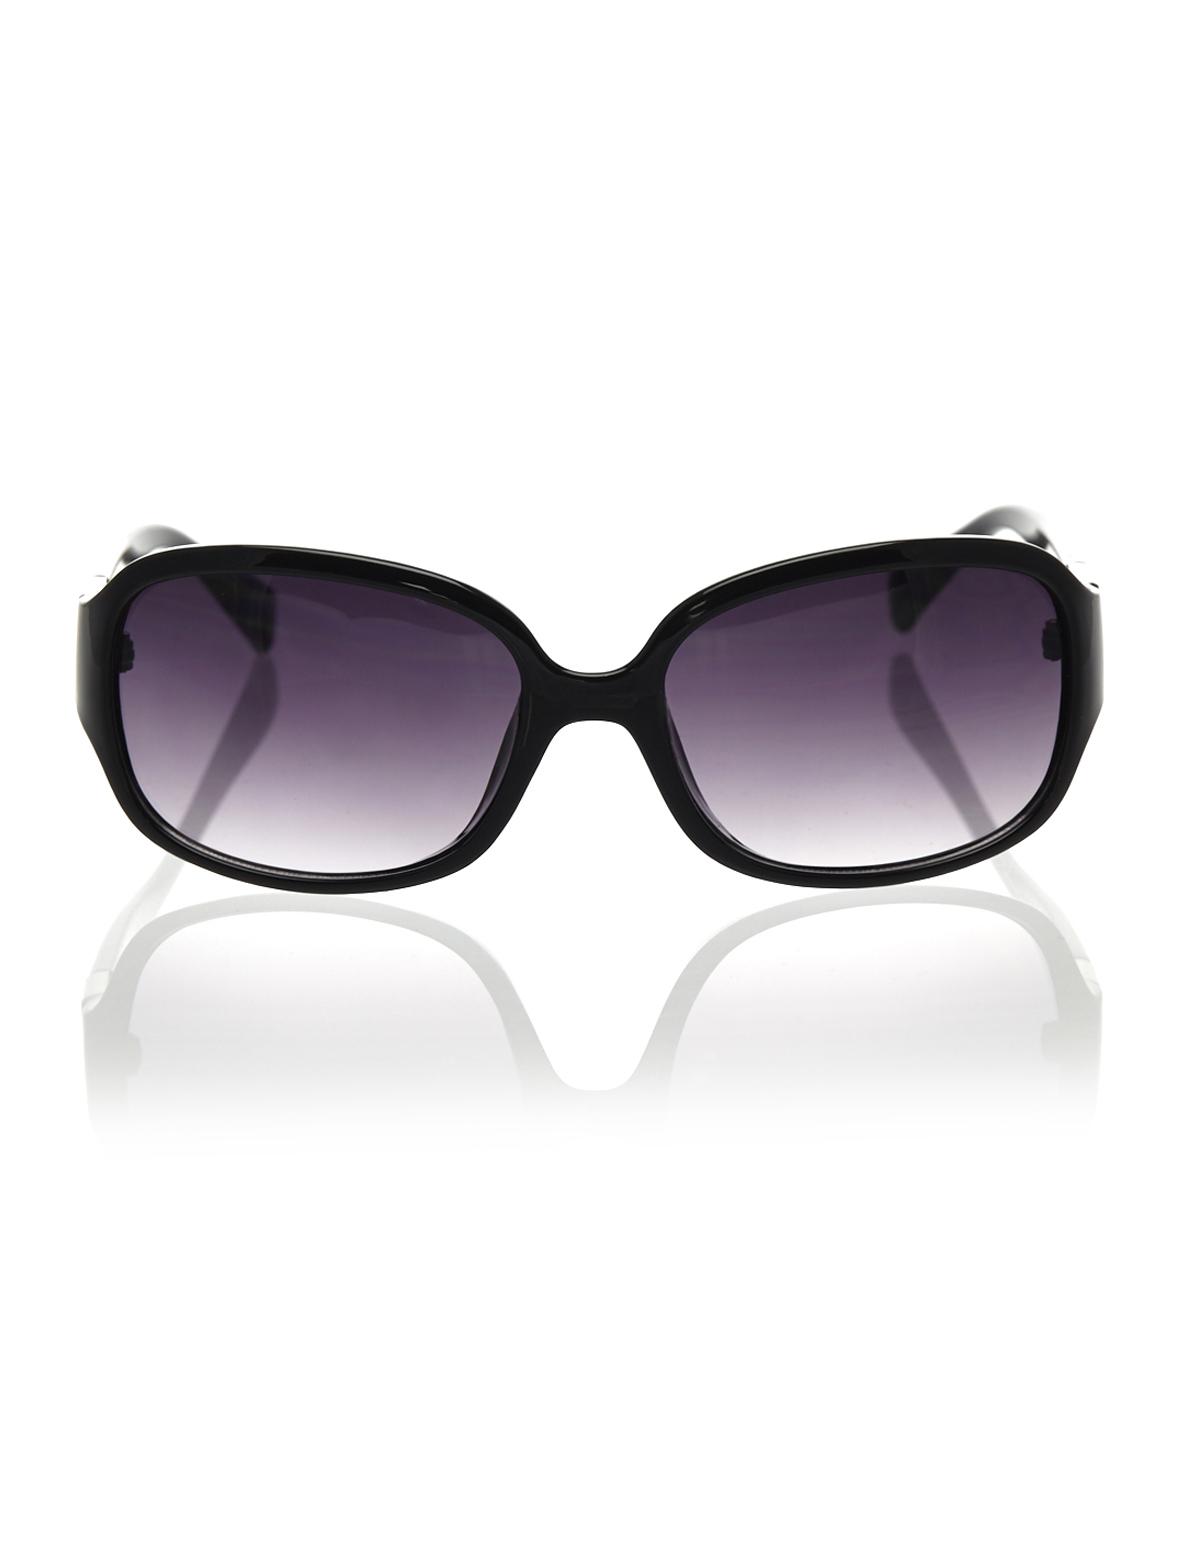 Black Small Frame Sunglasses | Cleo